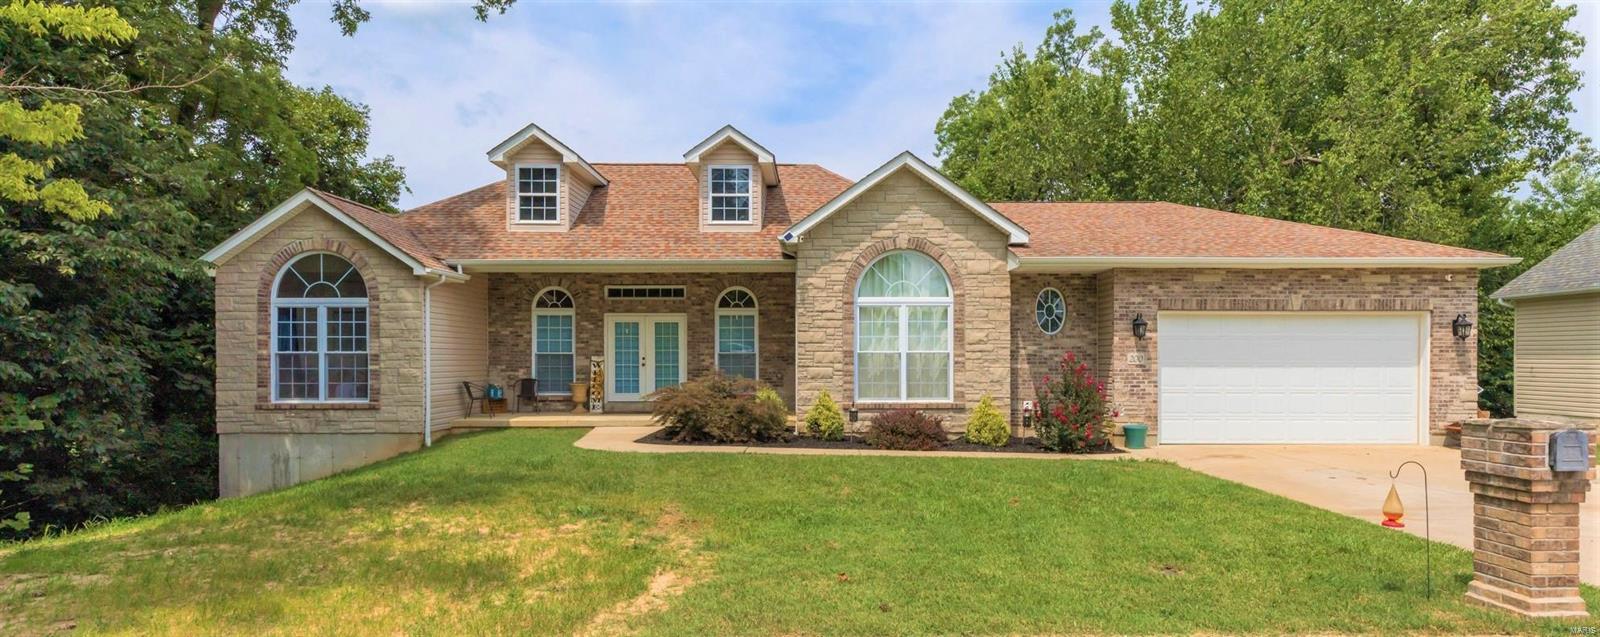 200 Oak Hill Hollow Property Photo